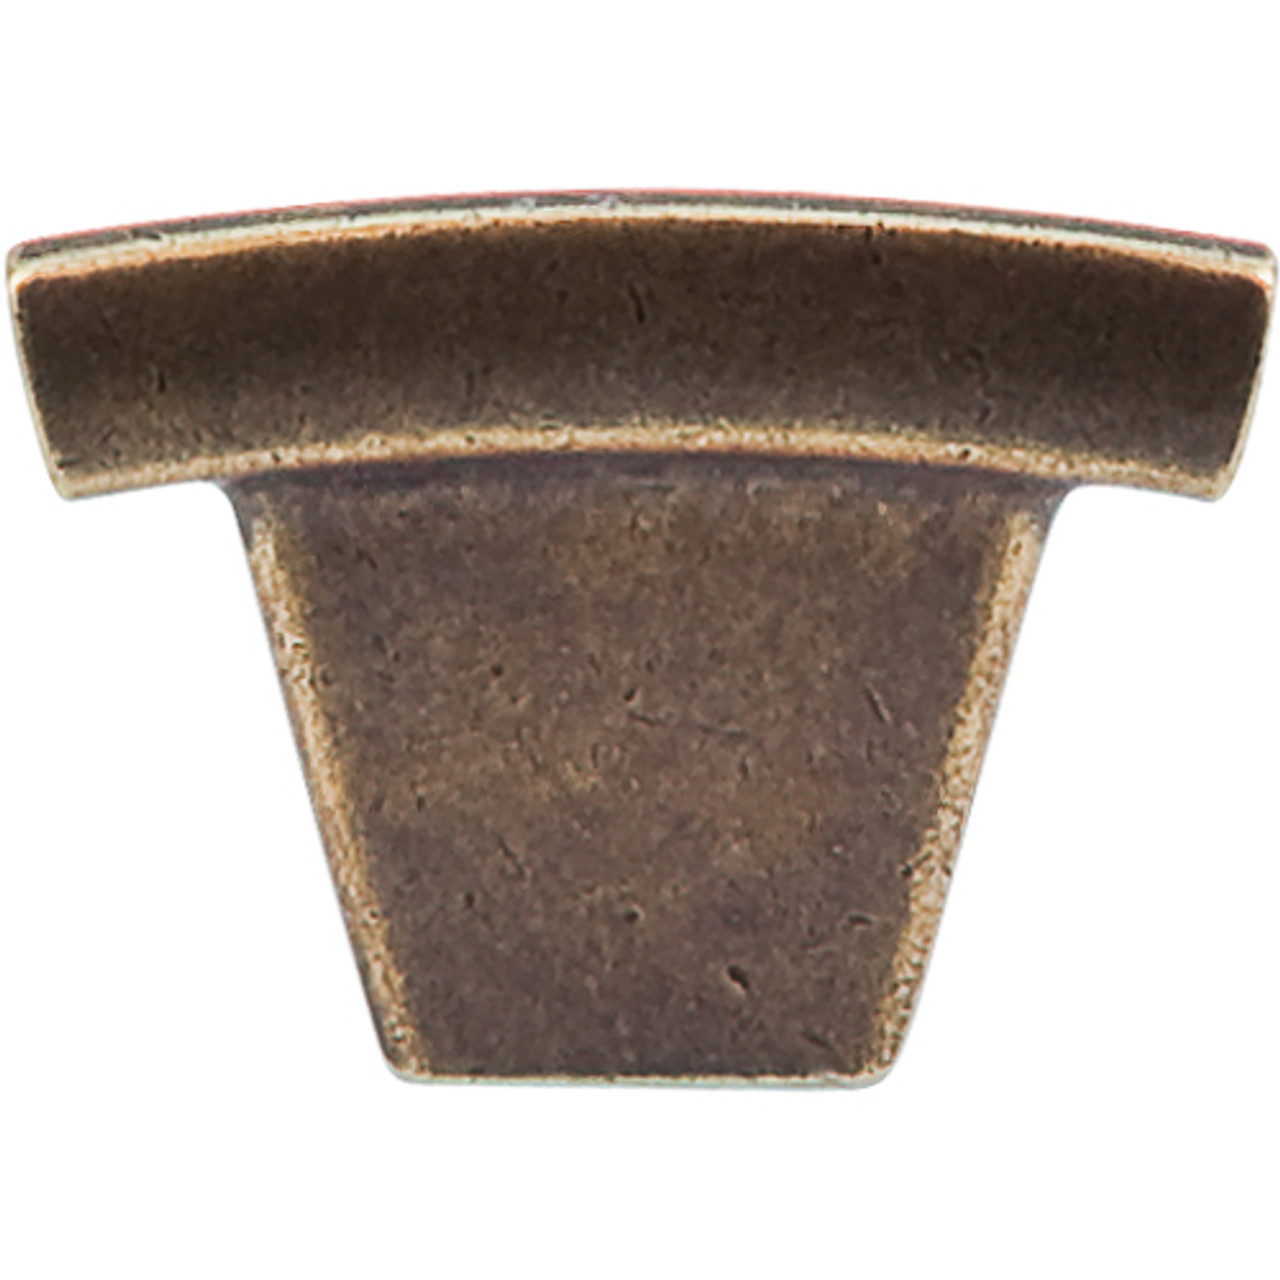 Top Knobs - Arched Knob   - German Bronze (TKTK1GBZ)